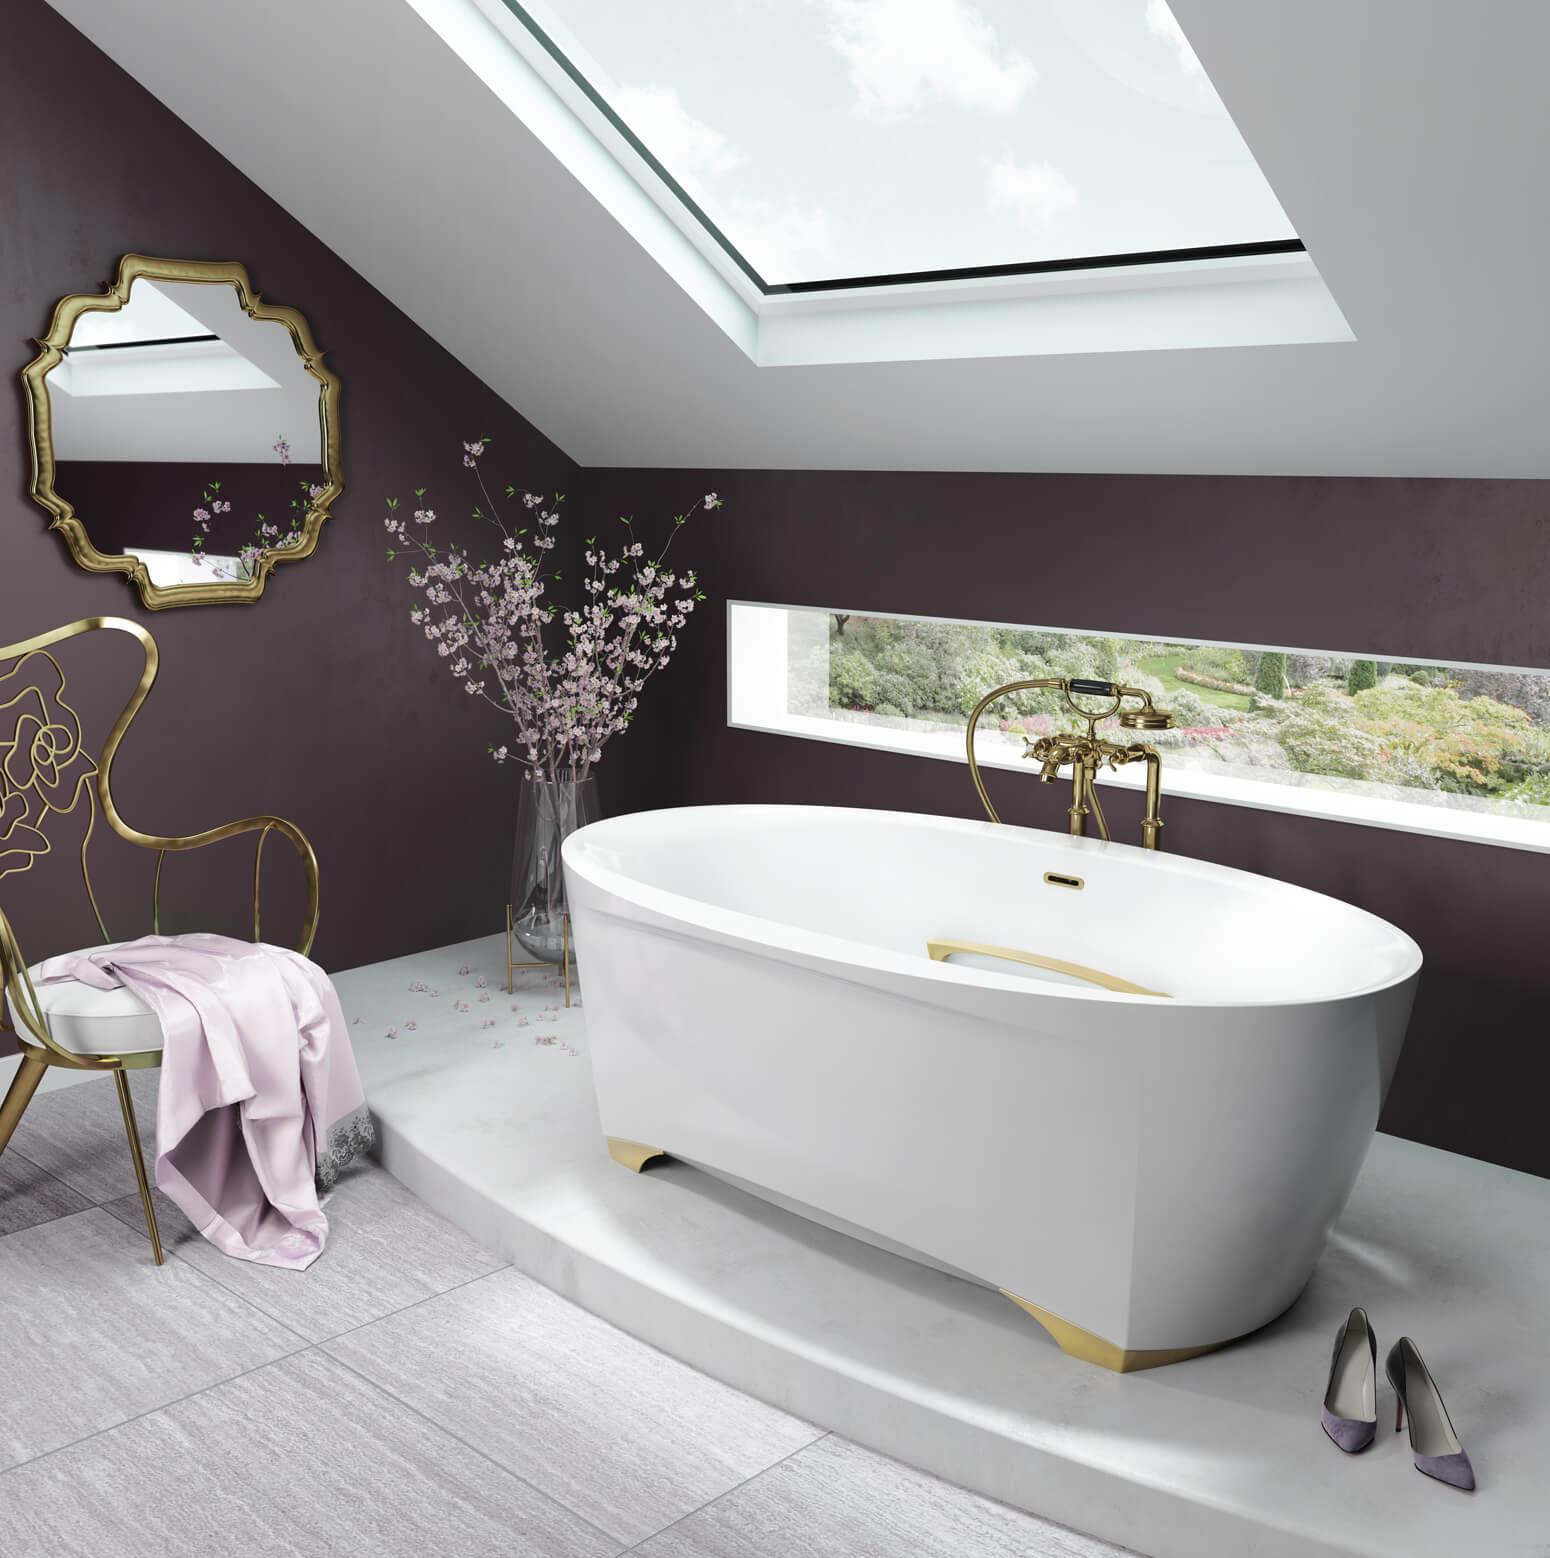 Scala 6638 air jet bathtub for your modern bathroom